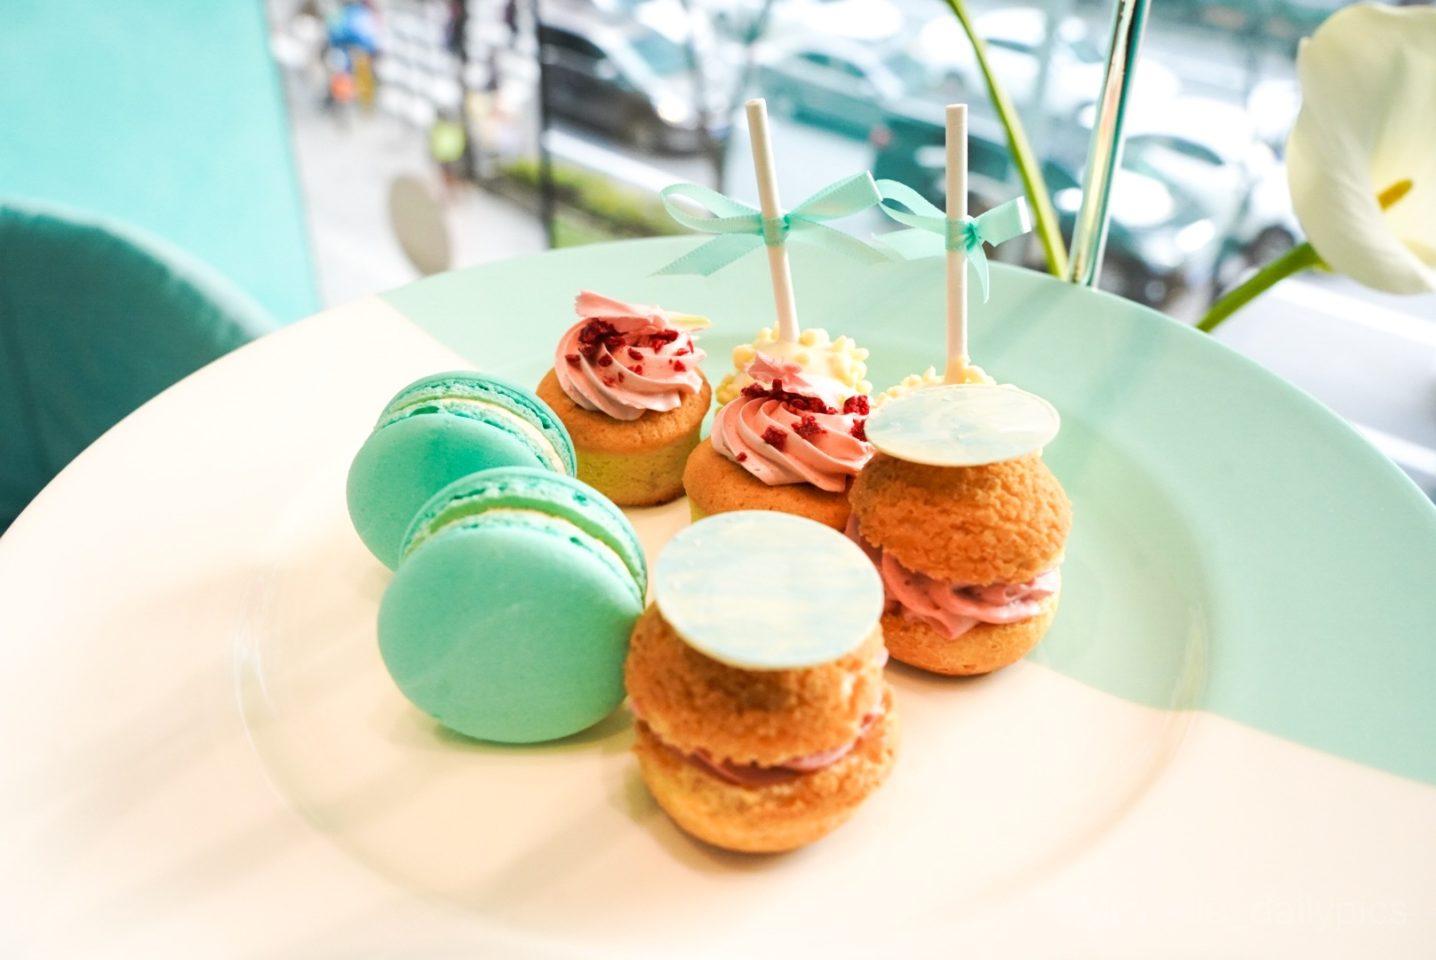 dsc07287 - The Tiffany Blue Box Cafe - 上海でティファニーアフタヌーンティーを満喫